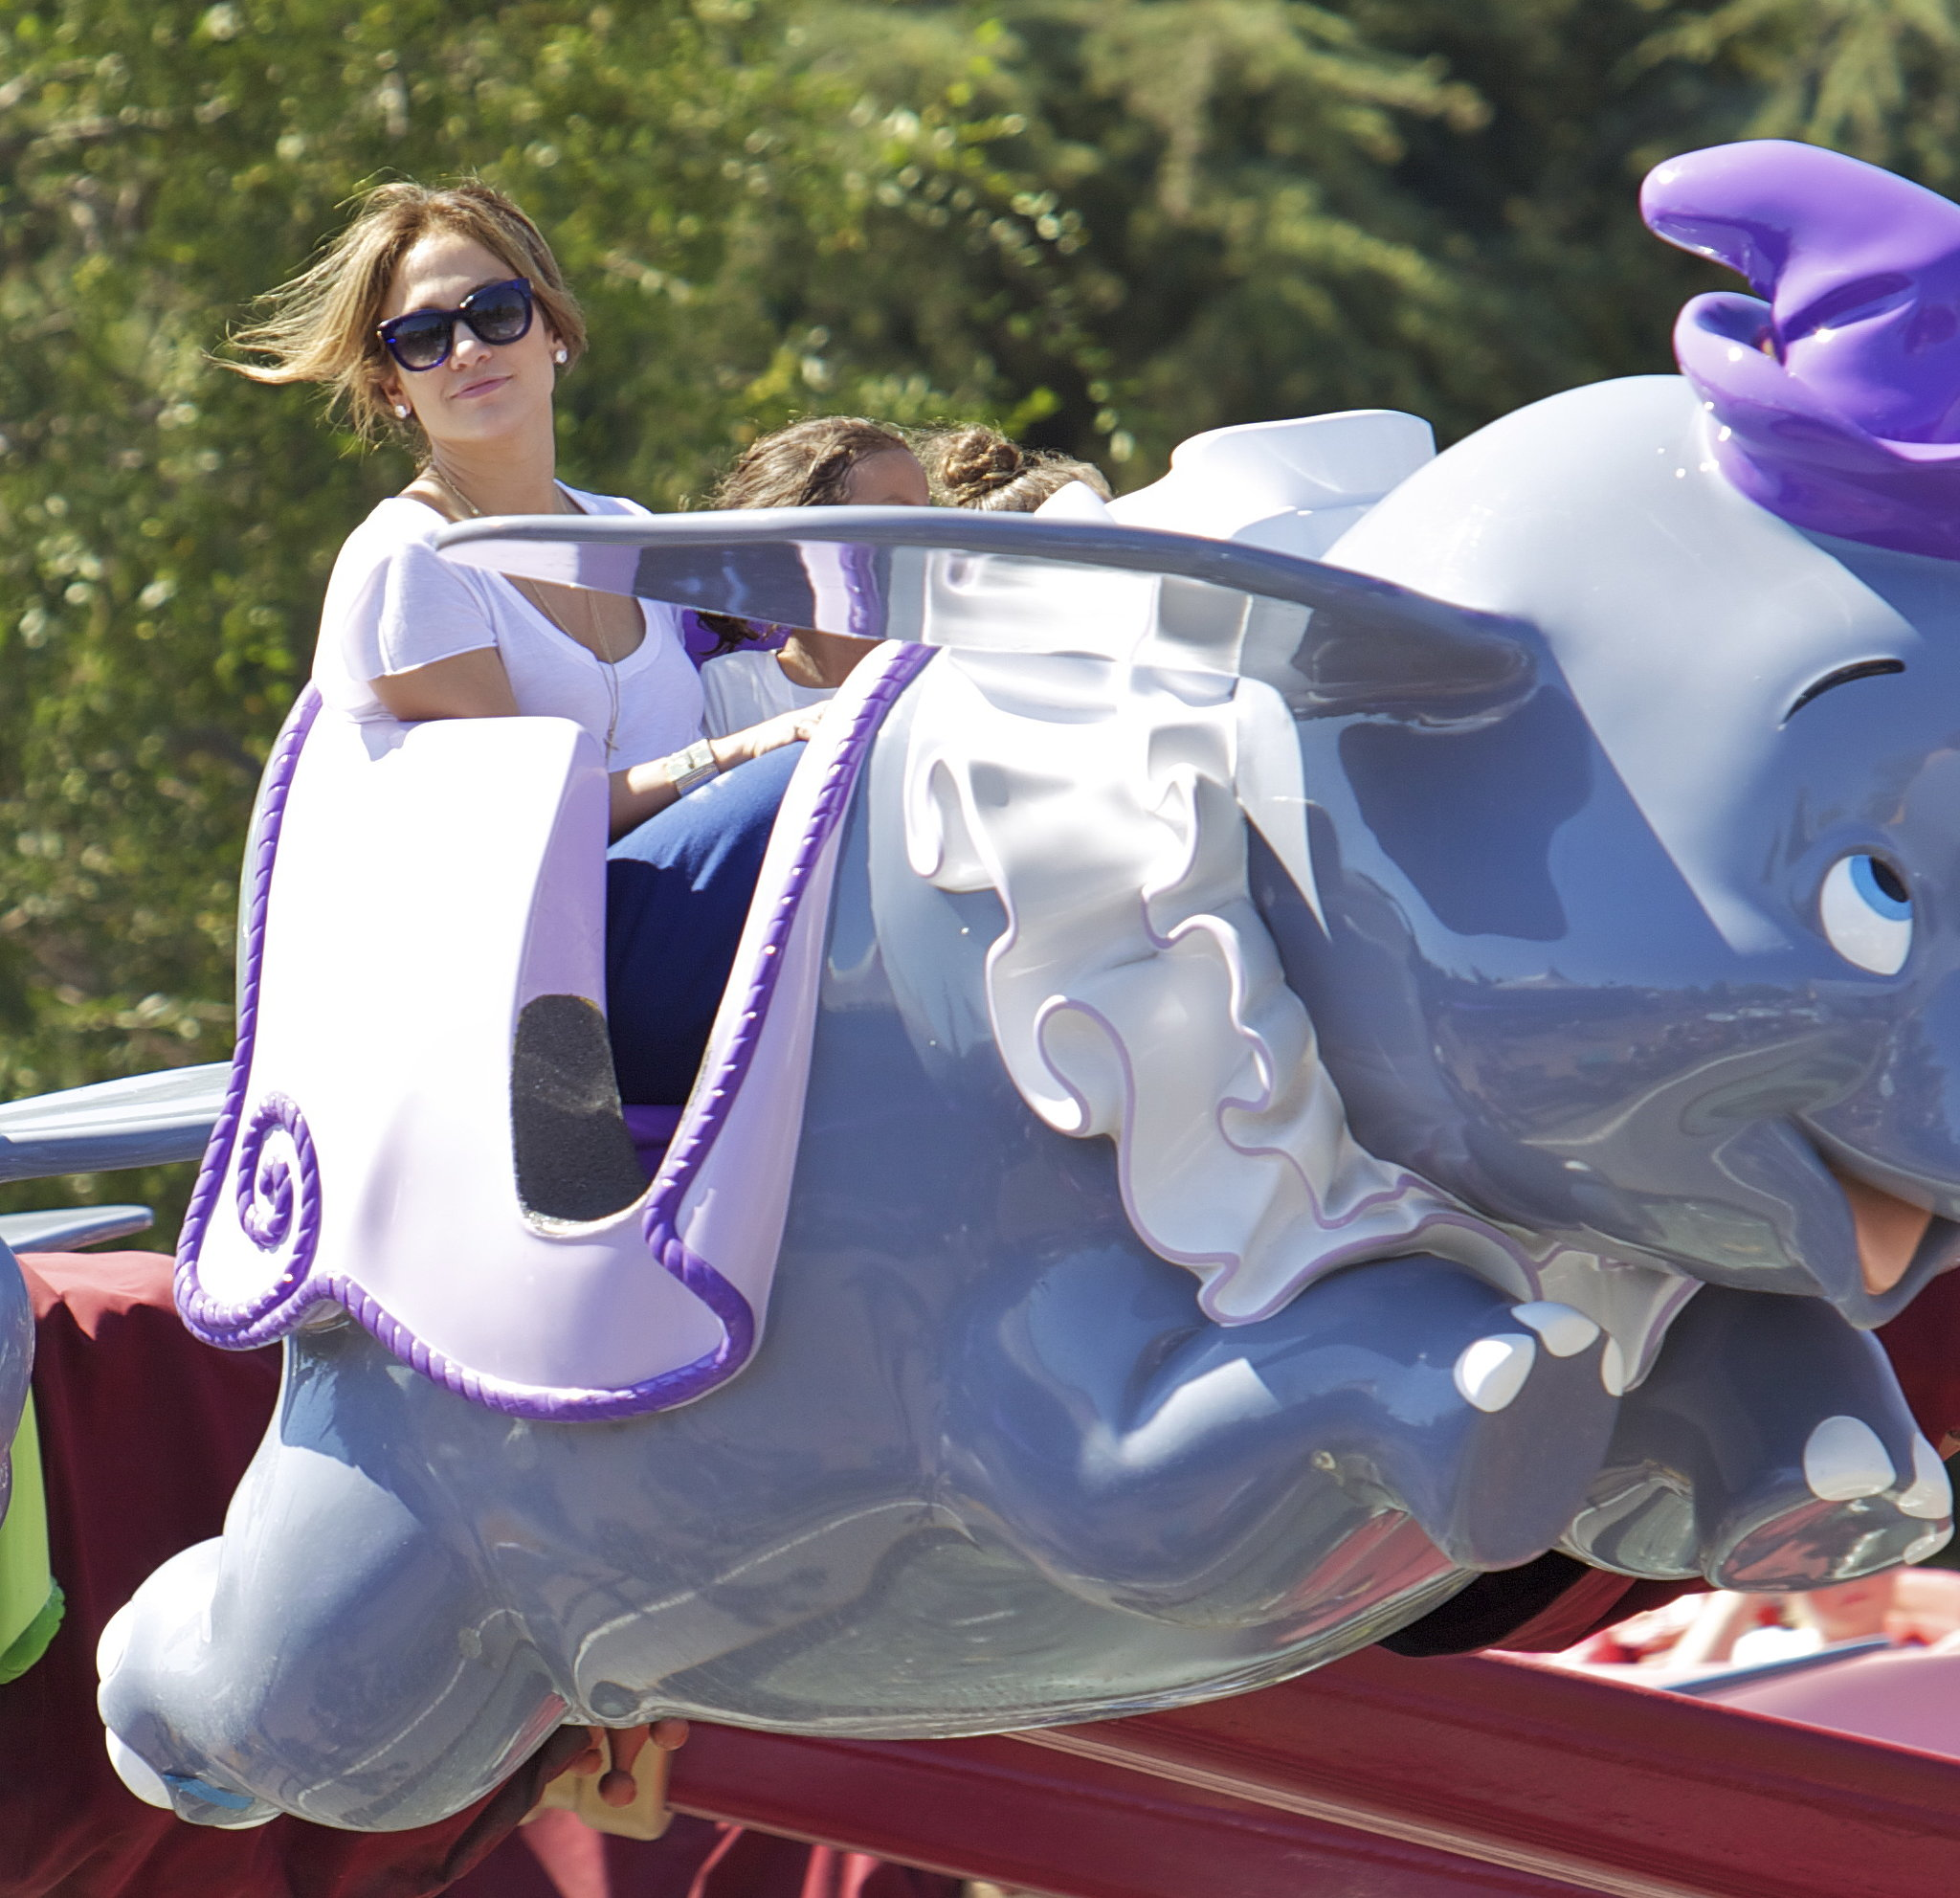 Jennifer Lopez sat with her daughter, Emme, on a ride at Disneyland.